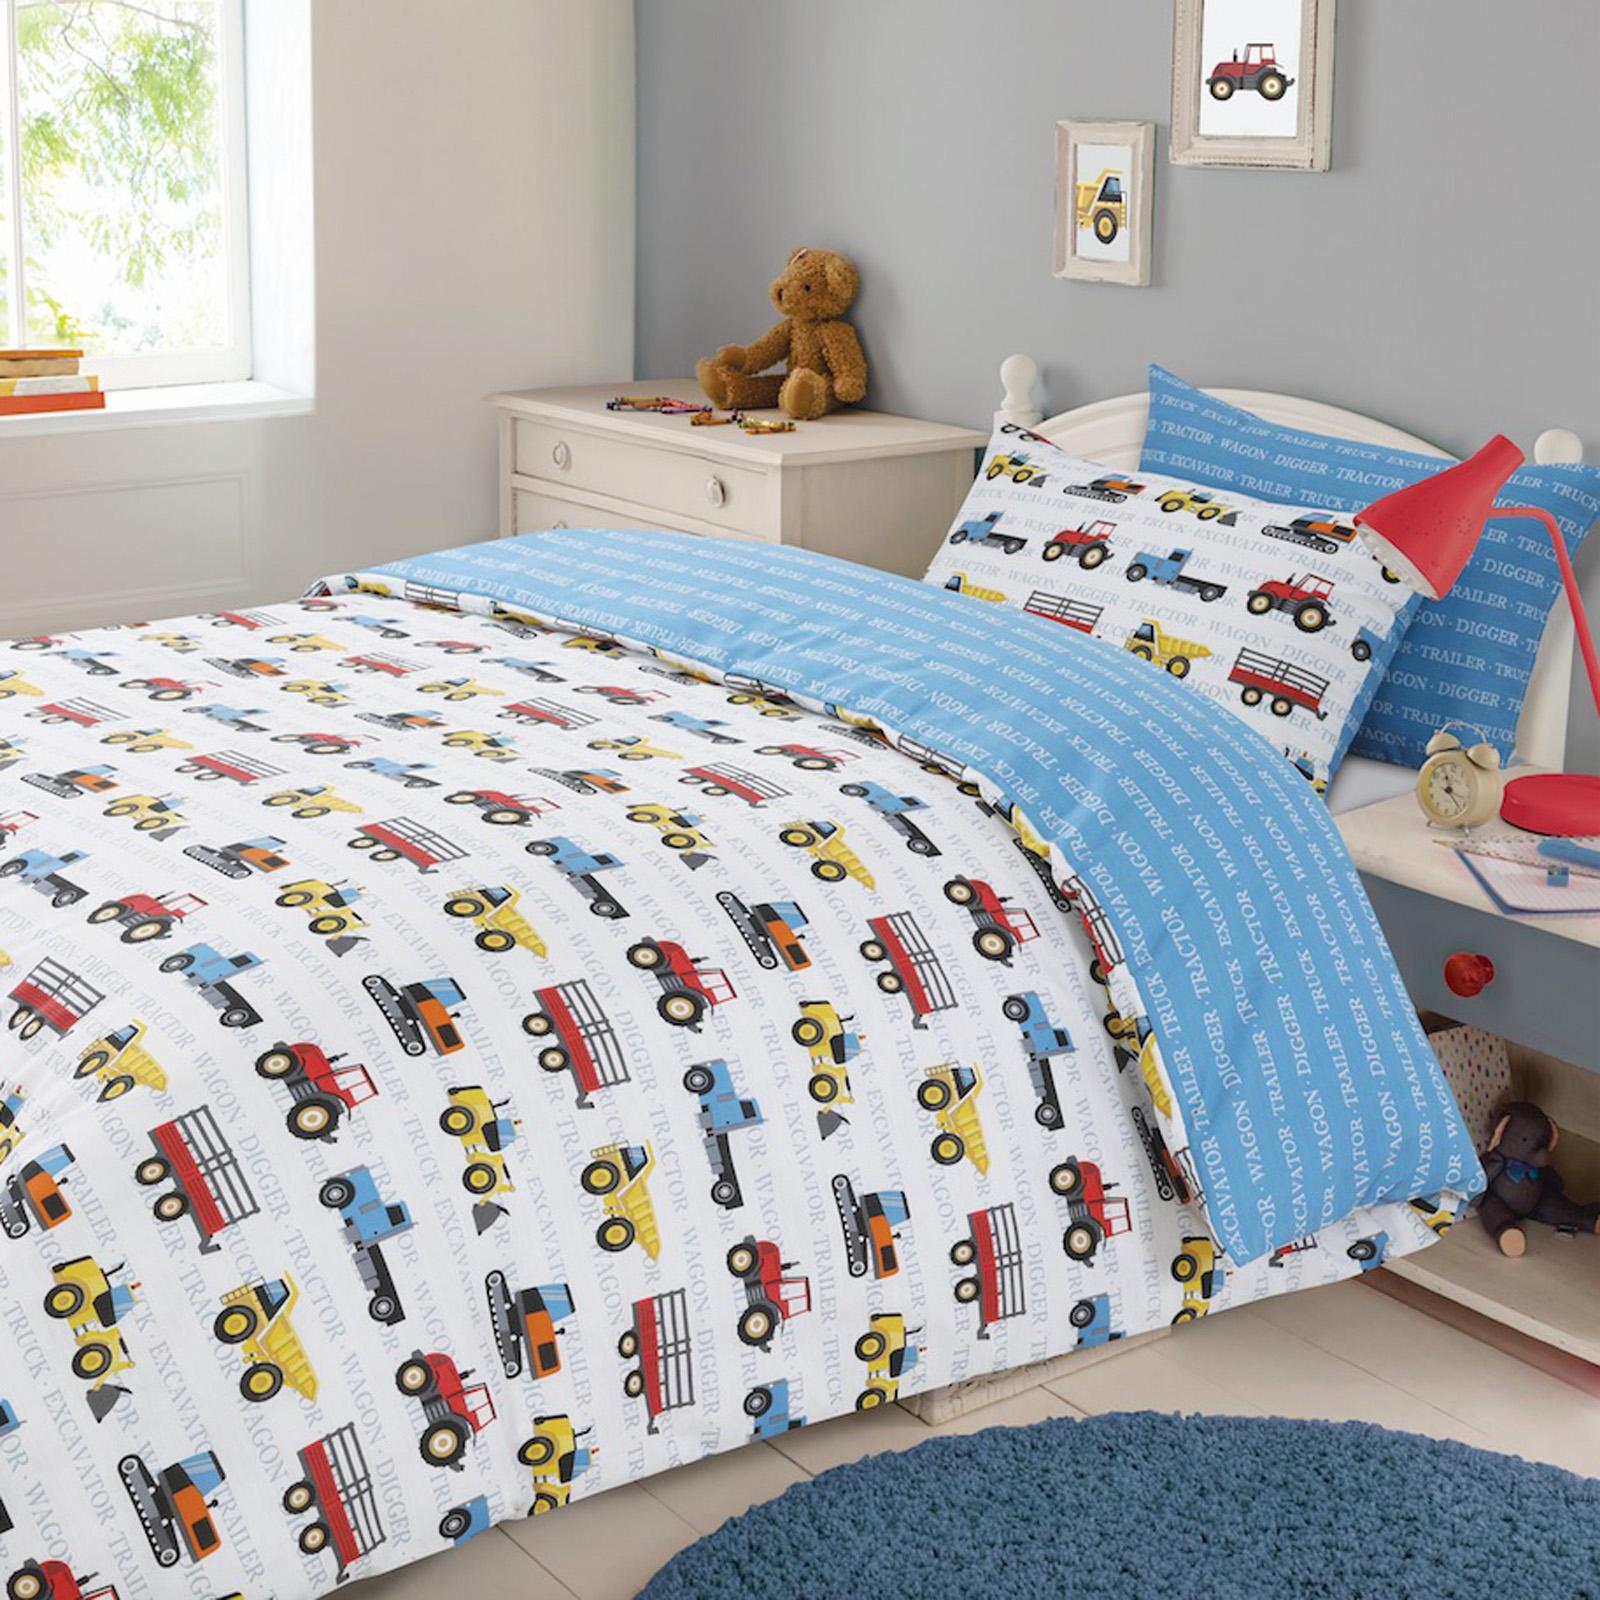 Dreamscene Transport Duvet Cover with Pillow Case Blue Kids Car Boys  Bedding Set